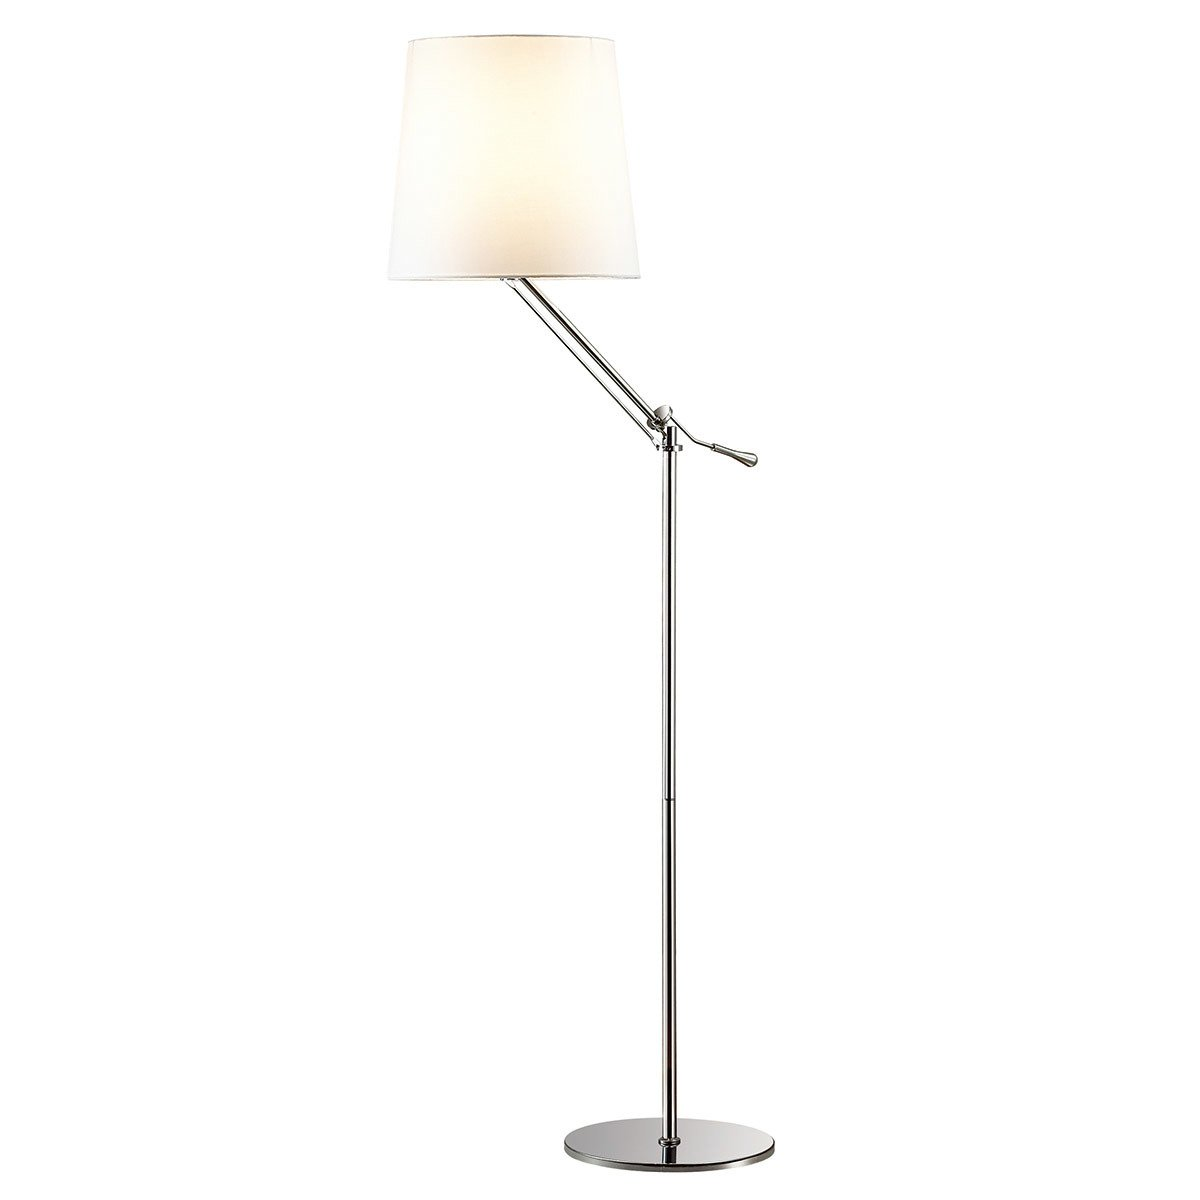 Otelio MA05098FA 001 02 Lampa Podłogowa Italux biała